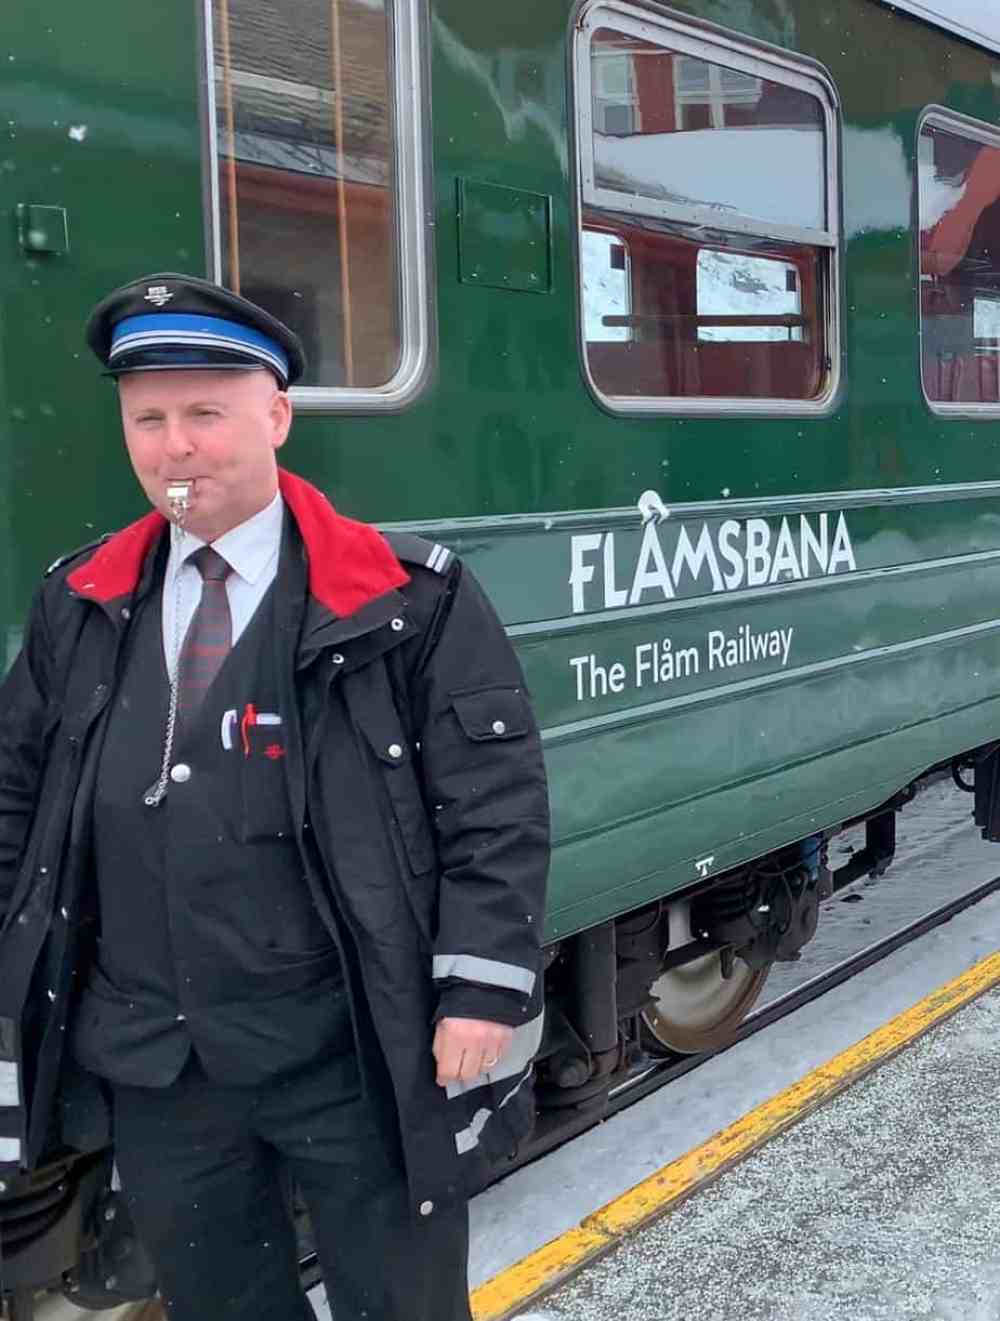 Tips for Flam railway in Norway